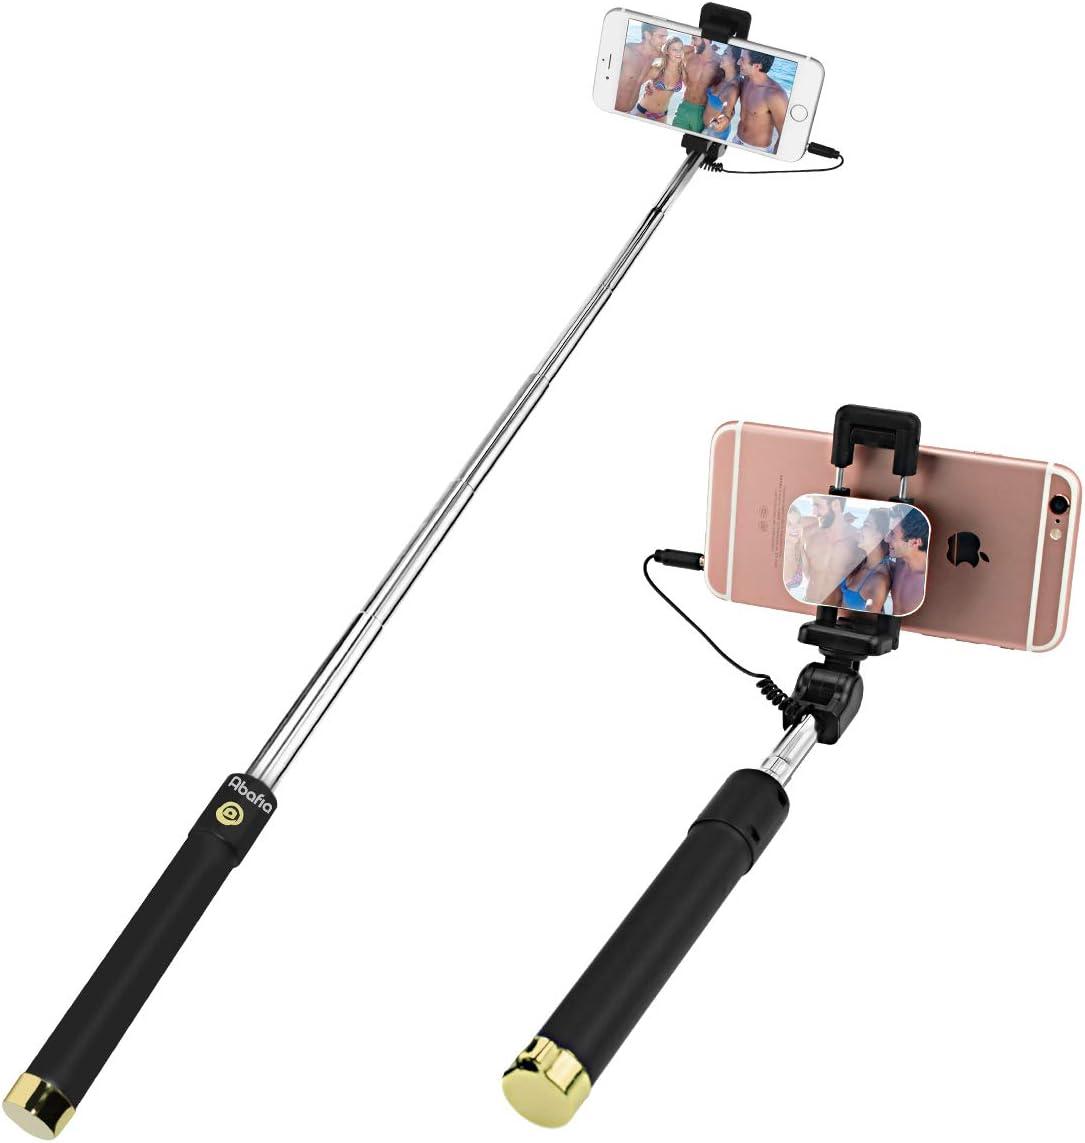 Handy- & Smartwatch-Zubehr Elektronik & Foto Hirkase Selfie Stick ...